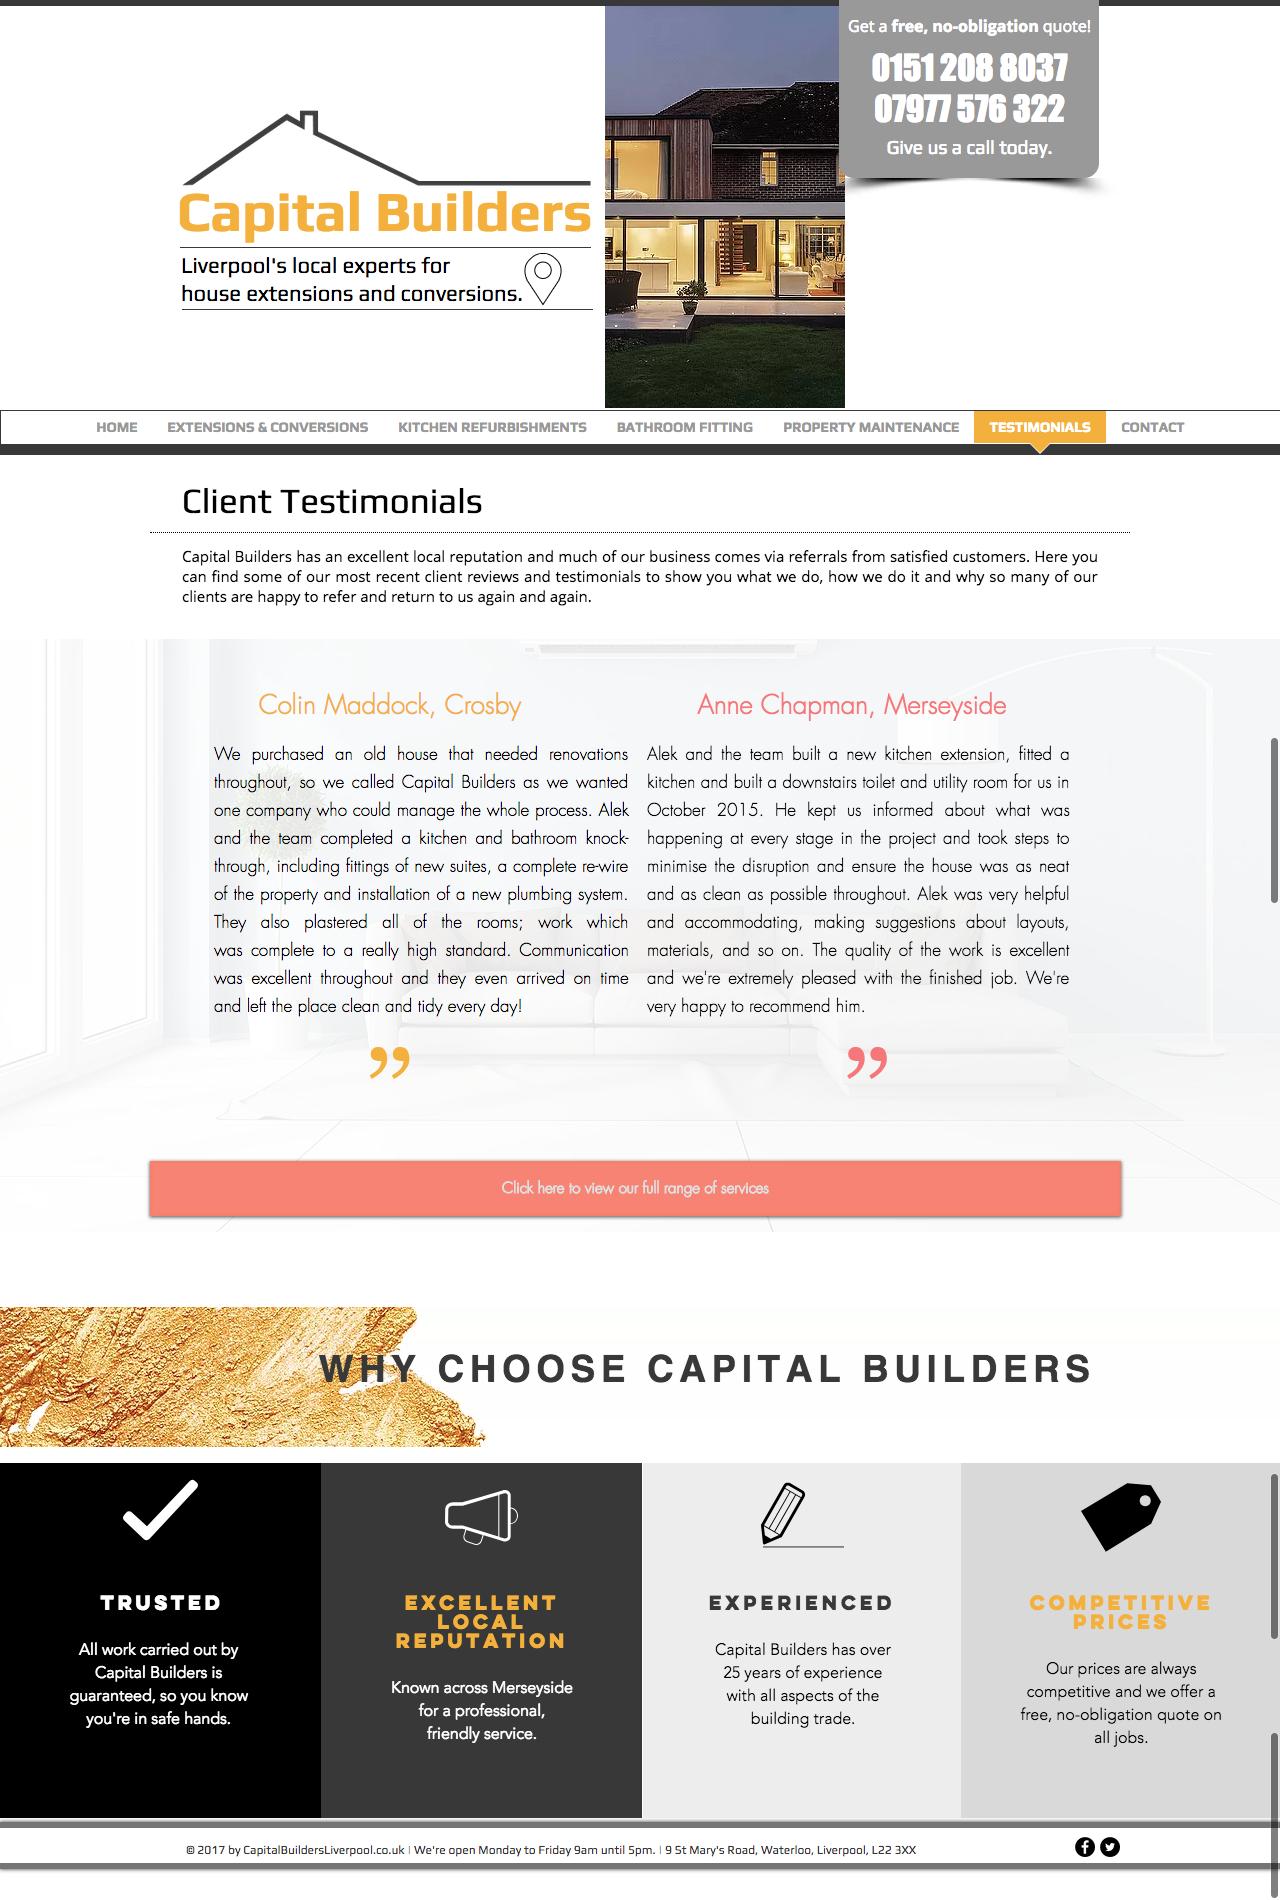 Capital Builders 6.png